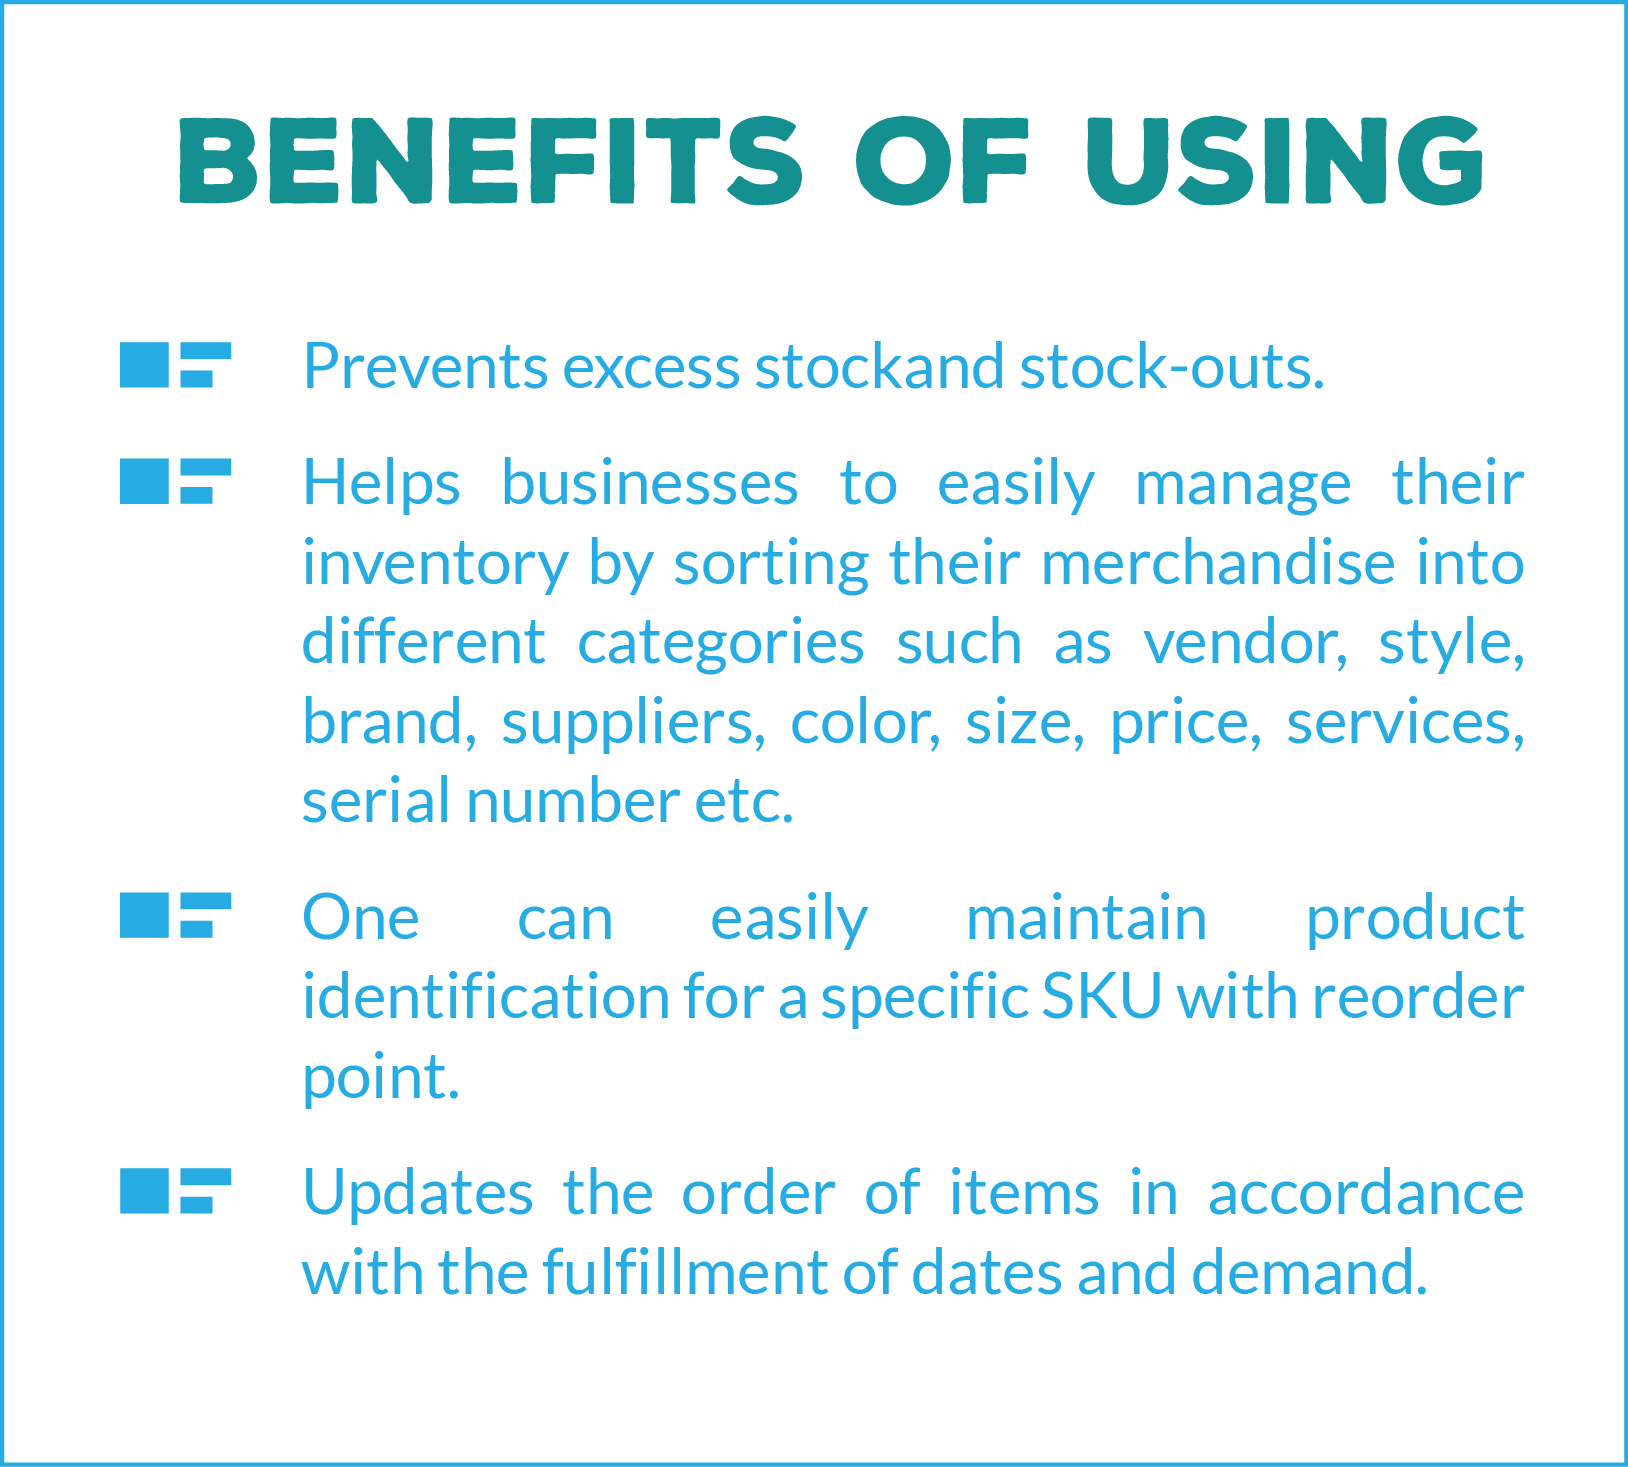 benefits_of_using_goRMG_store